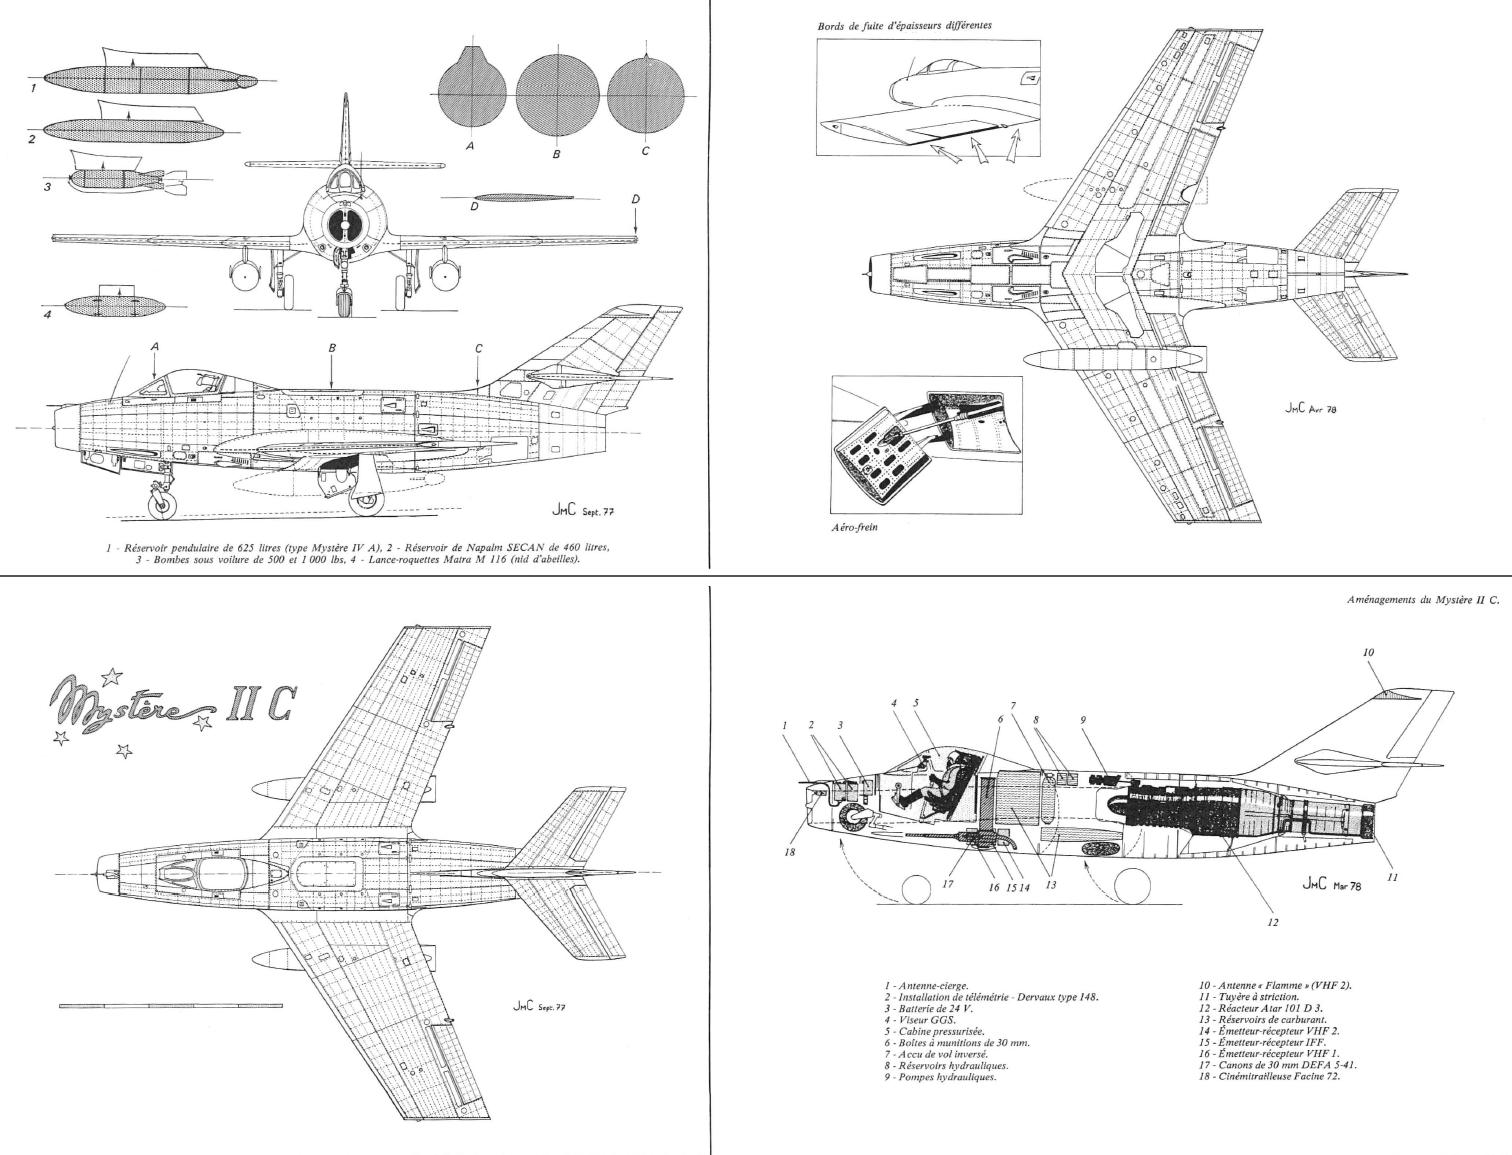 md 452 mystere ii planes dassault md 452 myst re ii aviation rh pinterest com